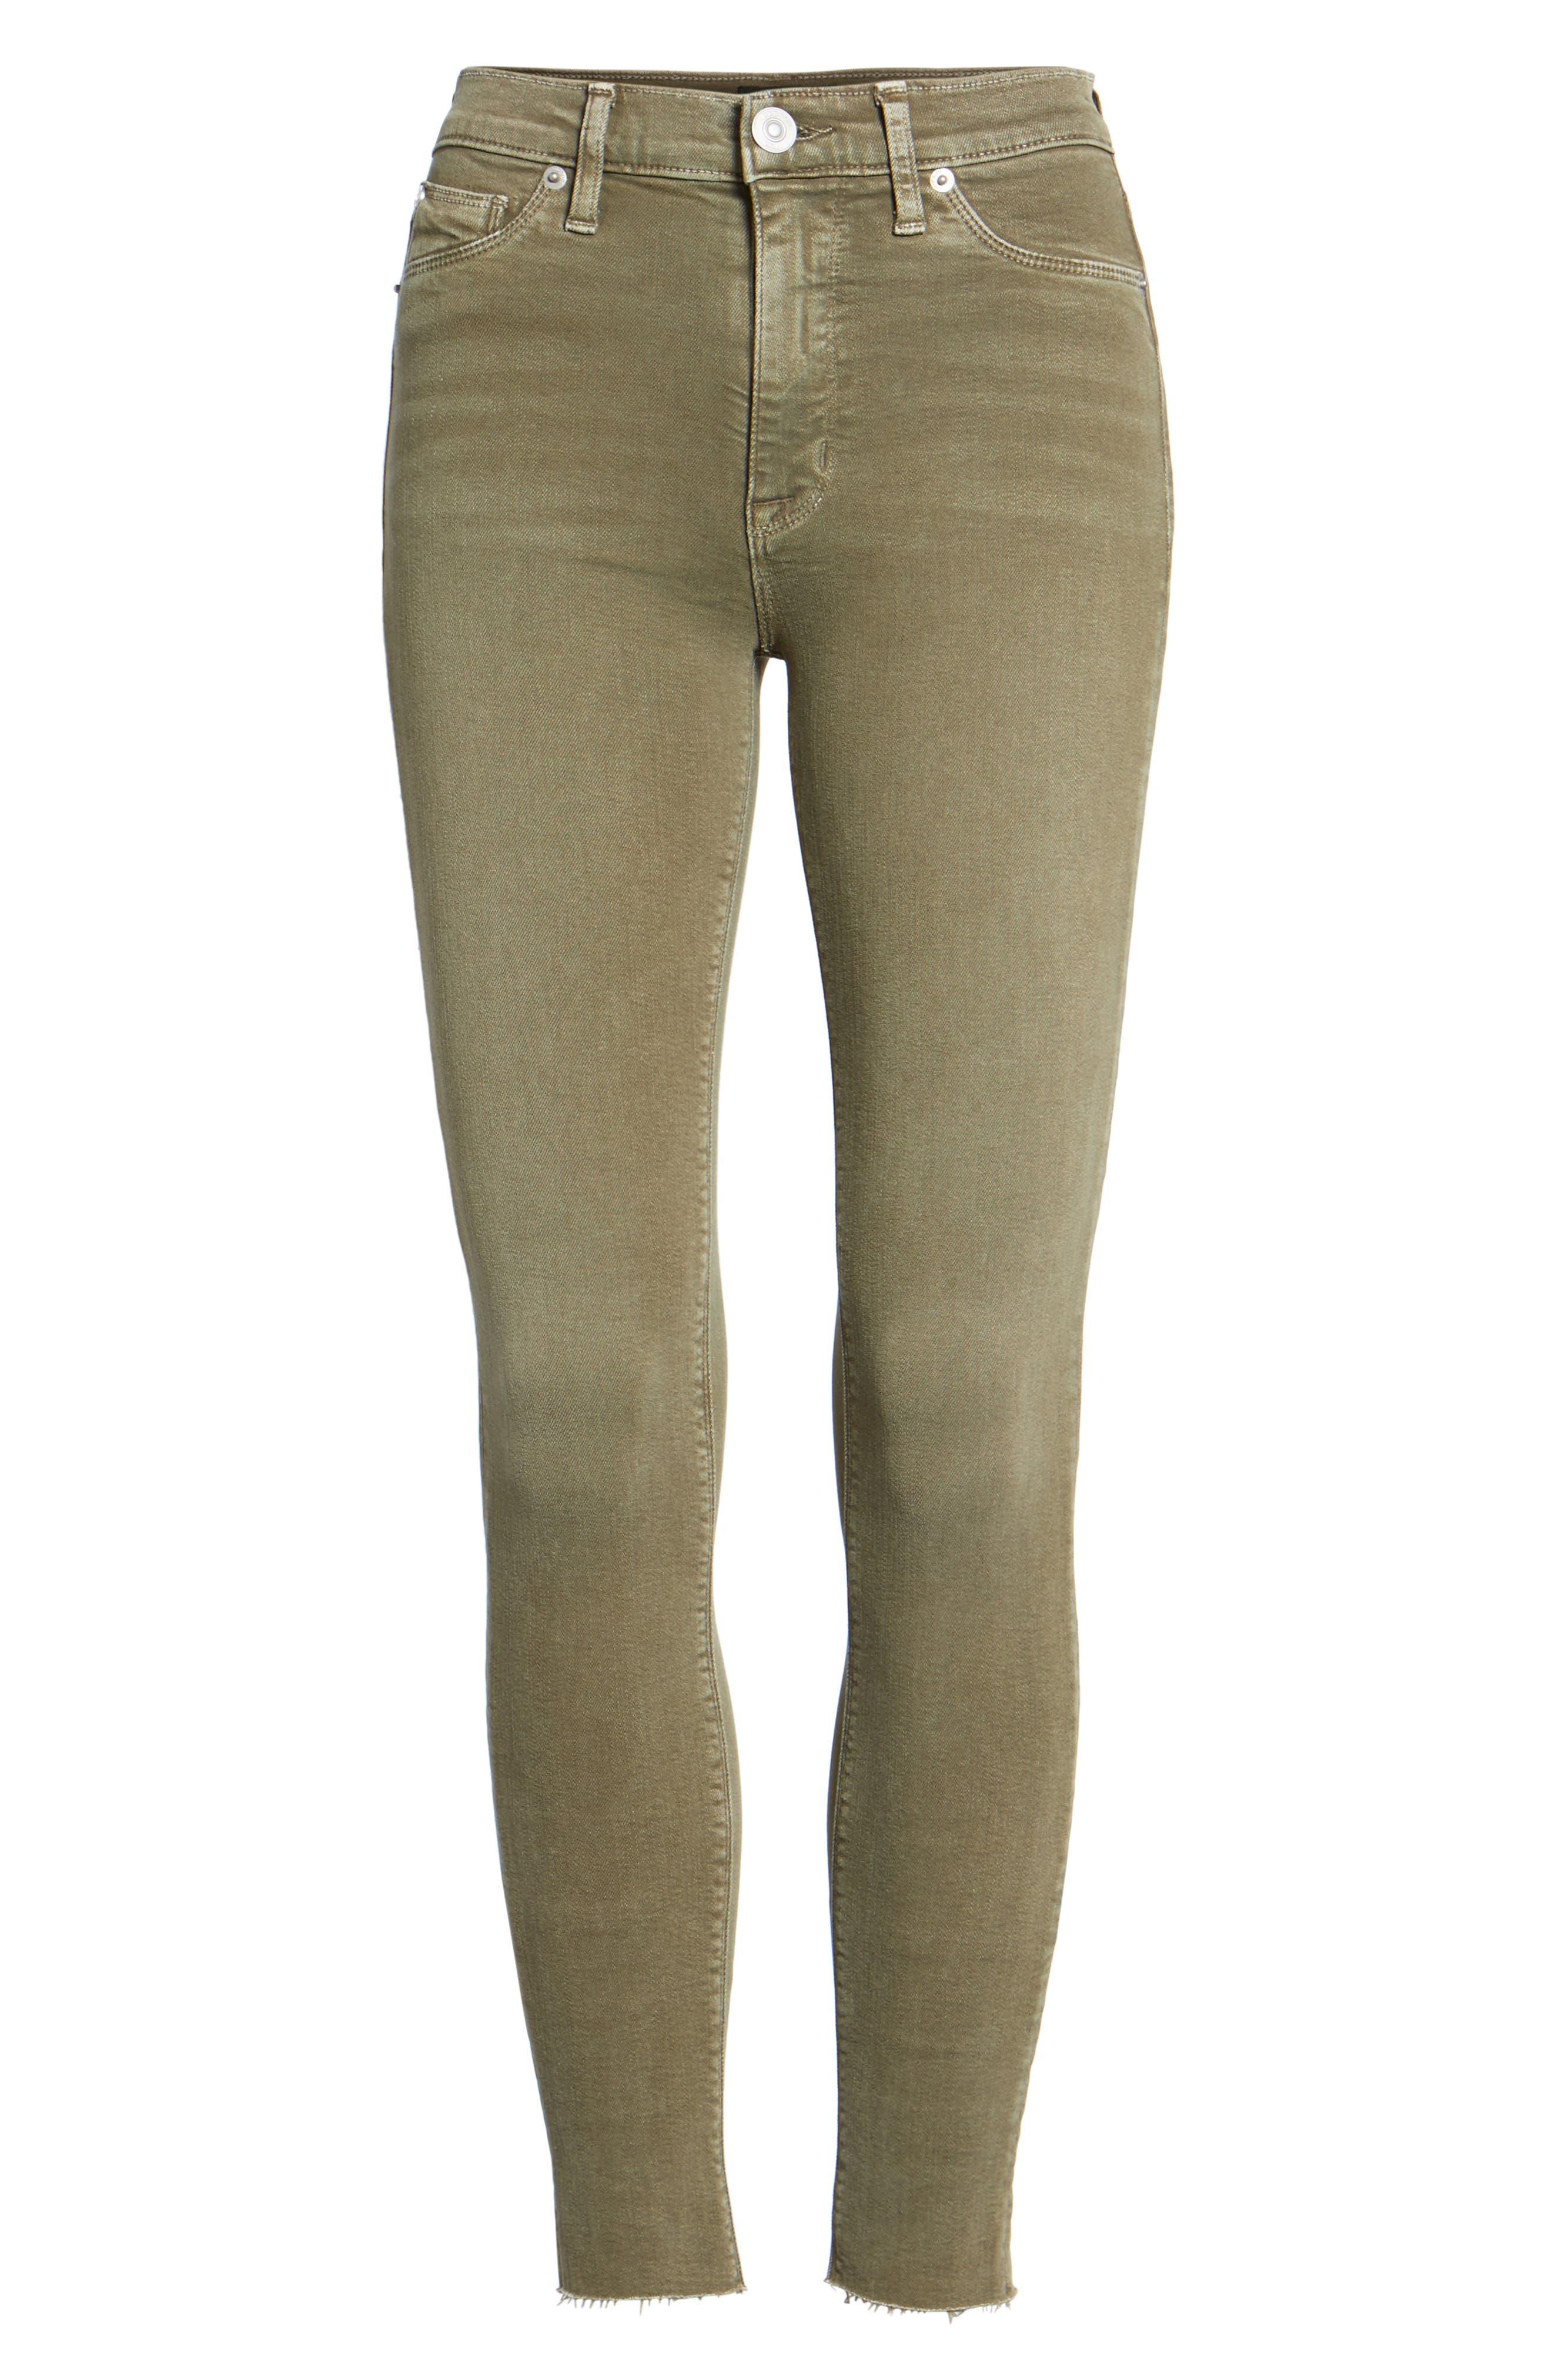 Barbara High Waist Ankle Skinny Jeans,                             Alternate thumbnail 22, color,